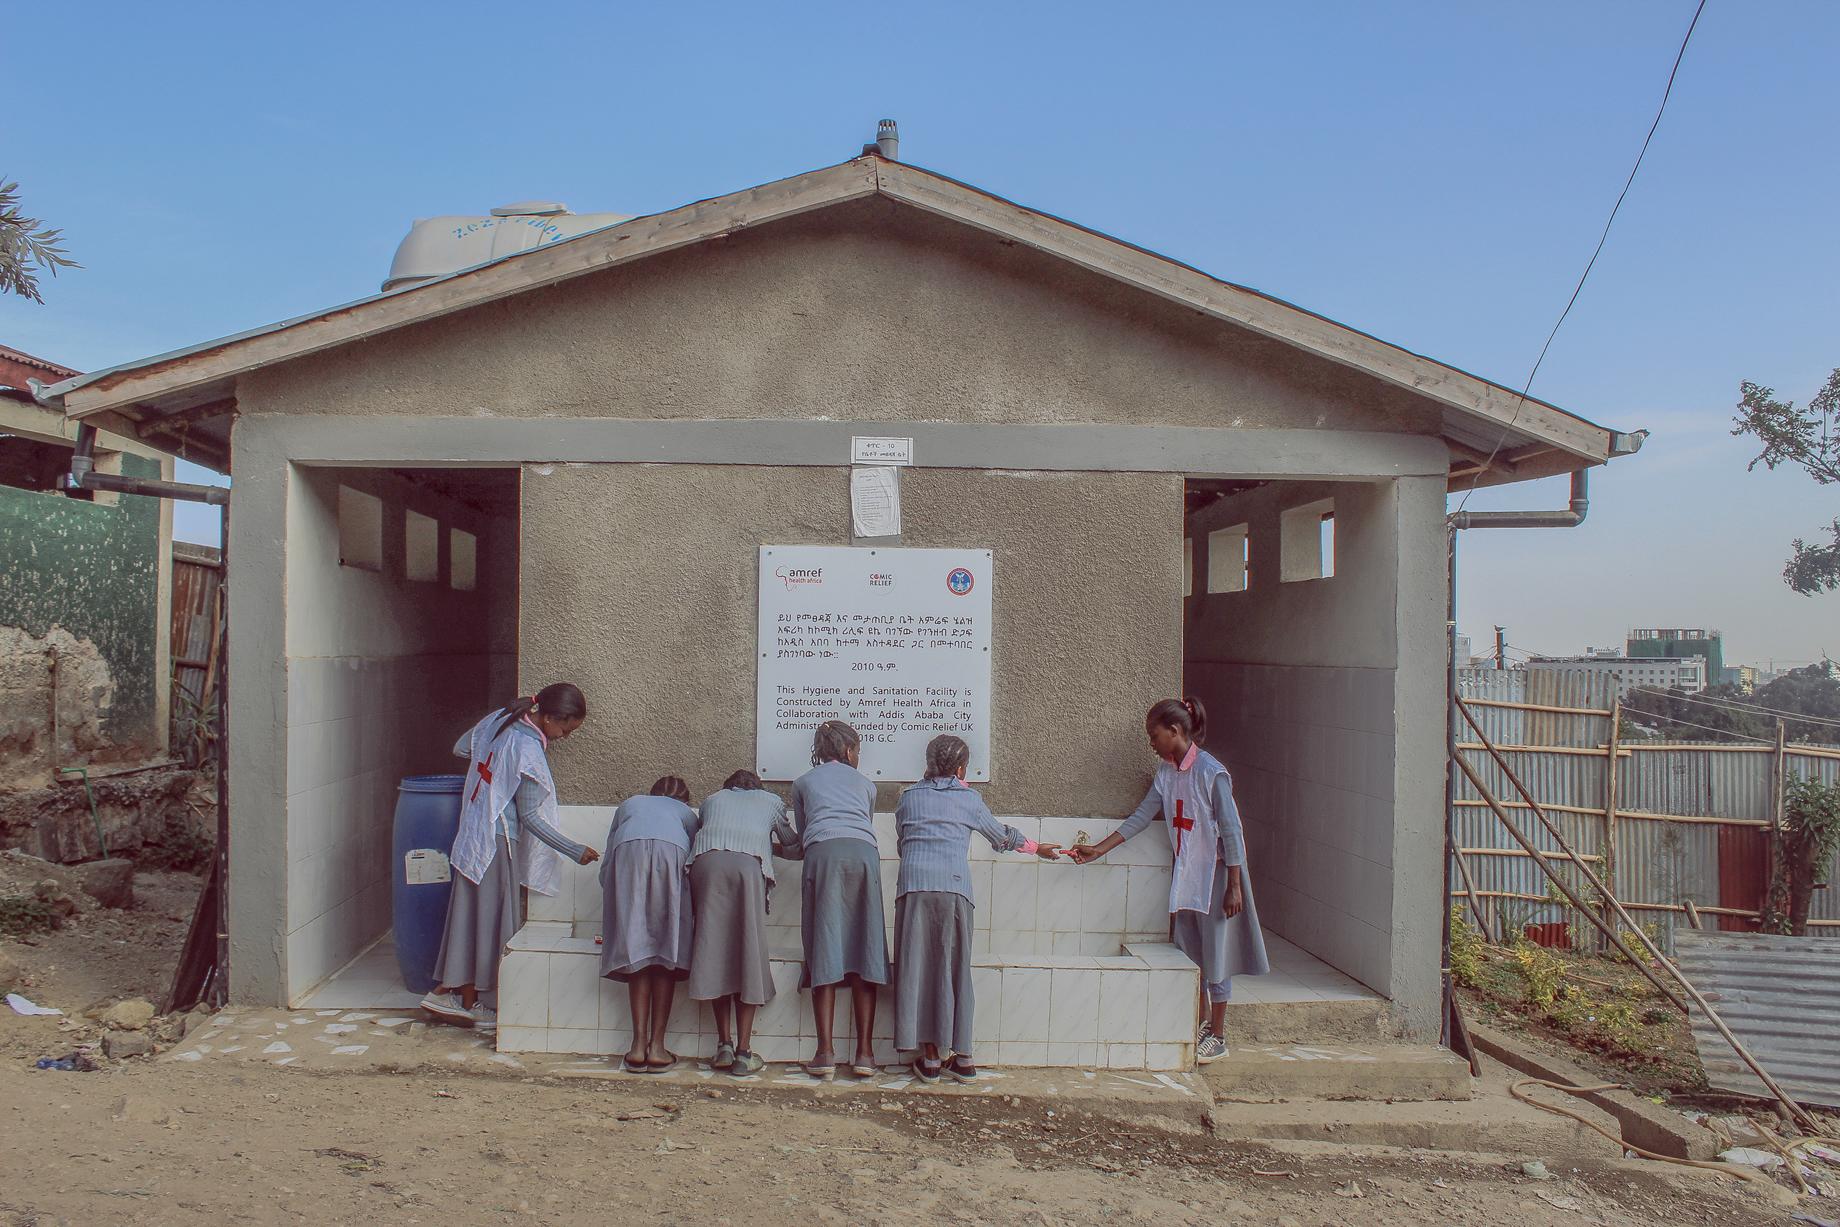 School WASH and Menstrual Hygiene Management